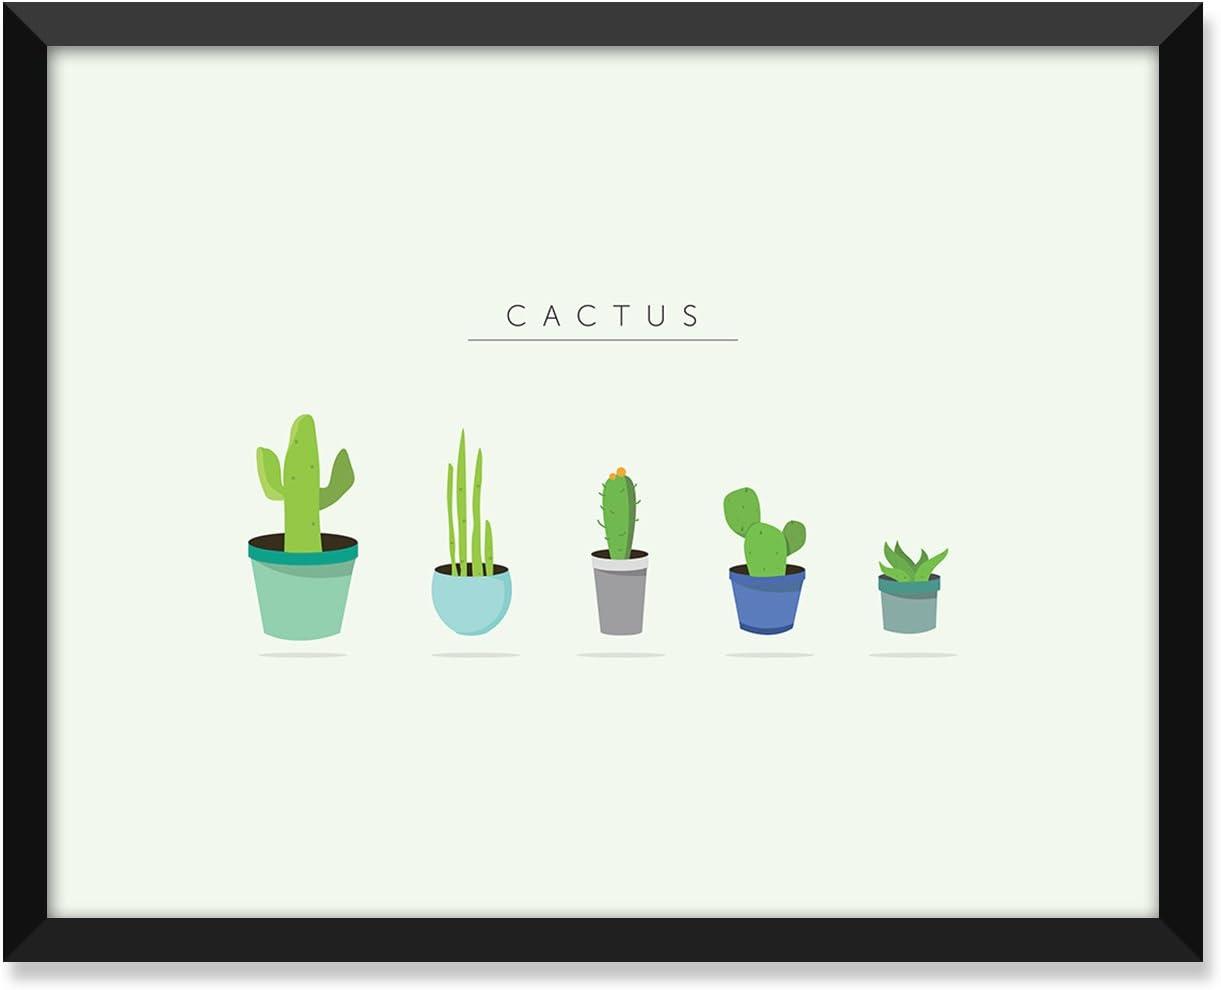 Amazon Com Serif Design Studios Cactus Cute Modern Illustration Minimalist Poster Home Decor College Dorm Room Decorations Wall Art Posters Prints